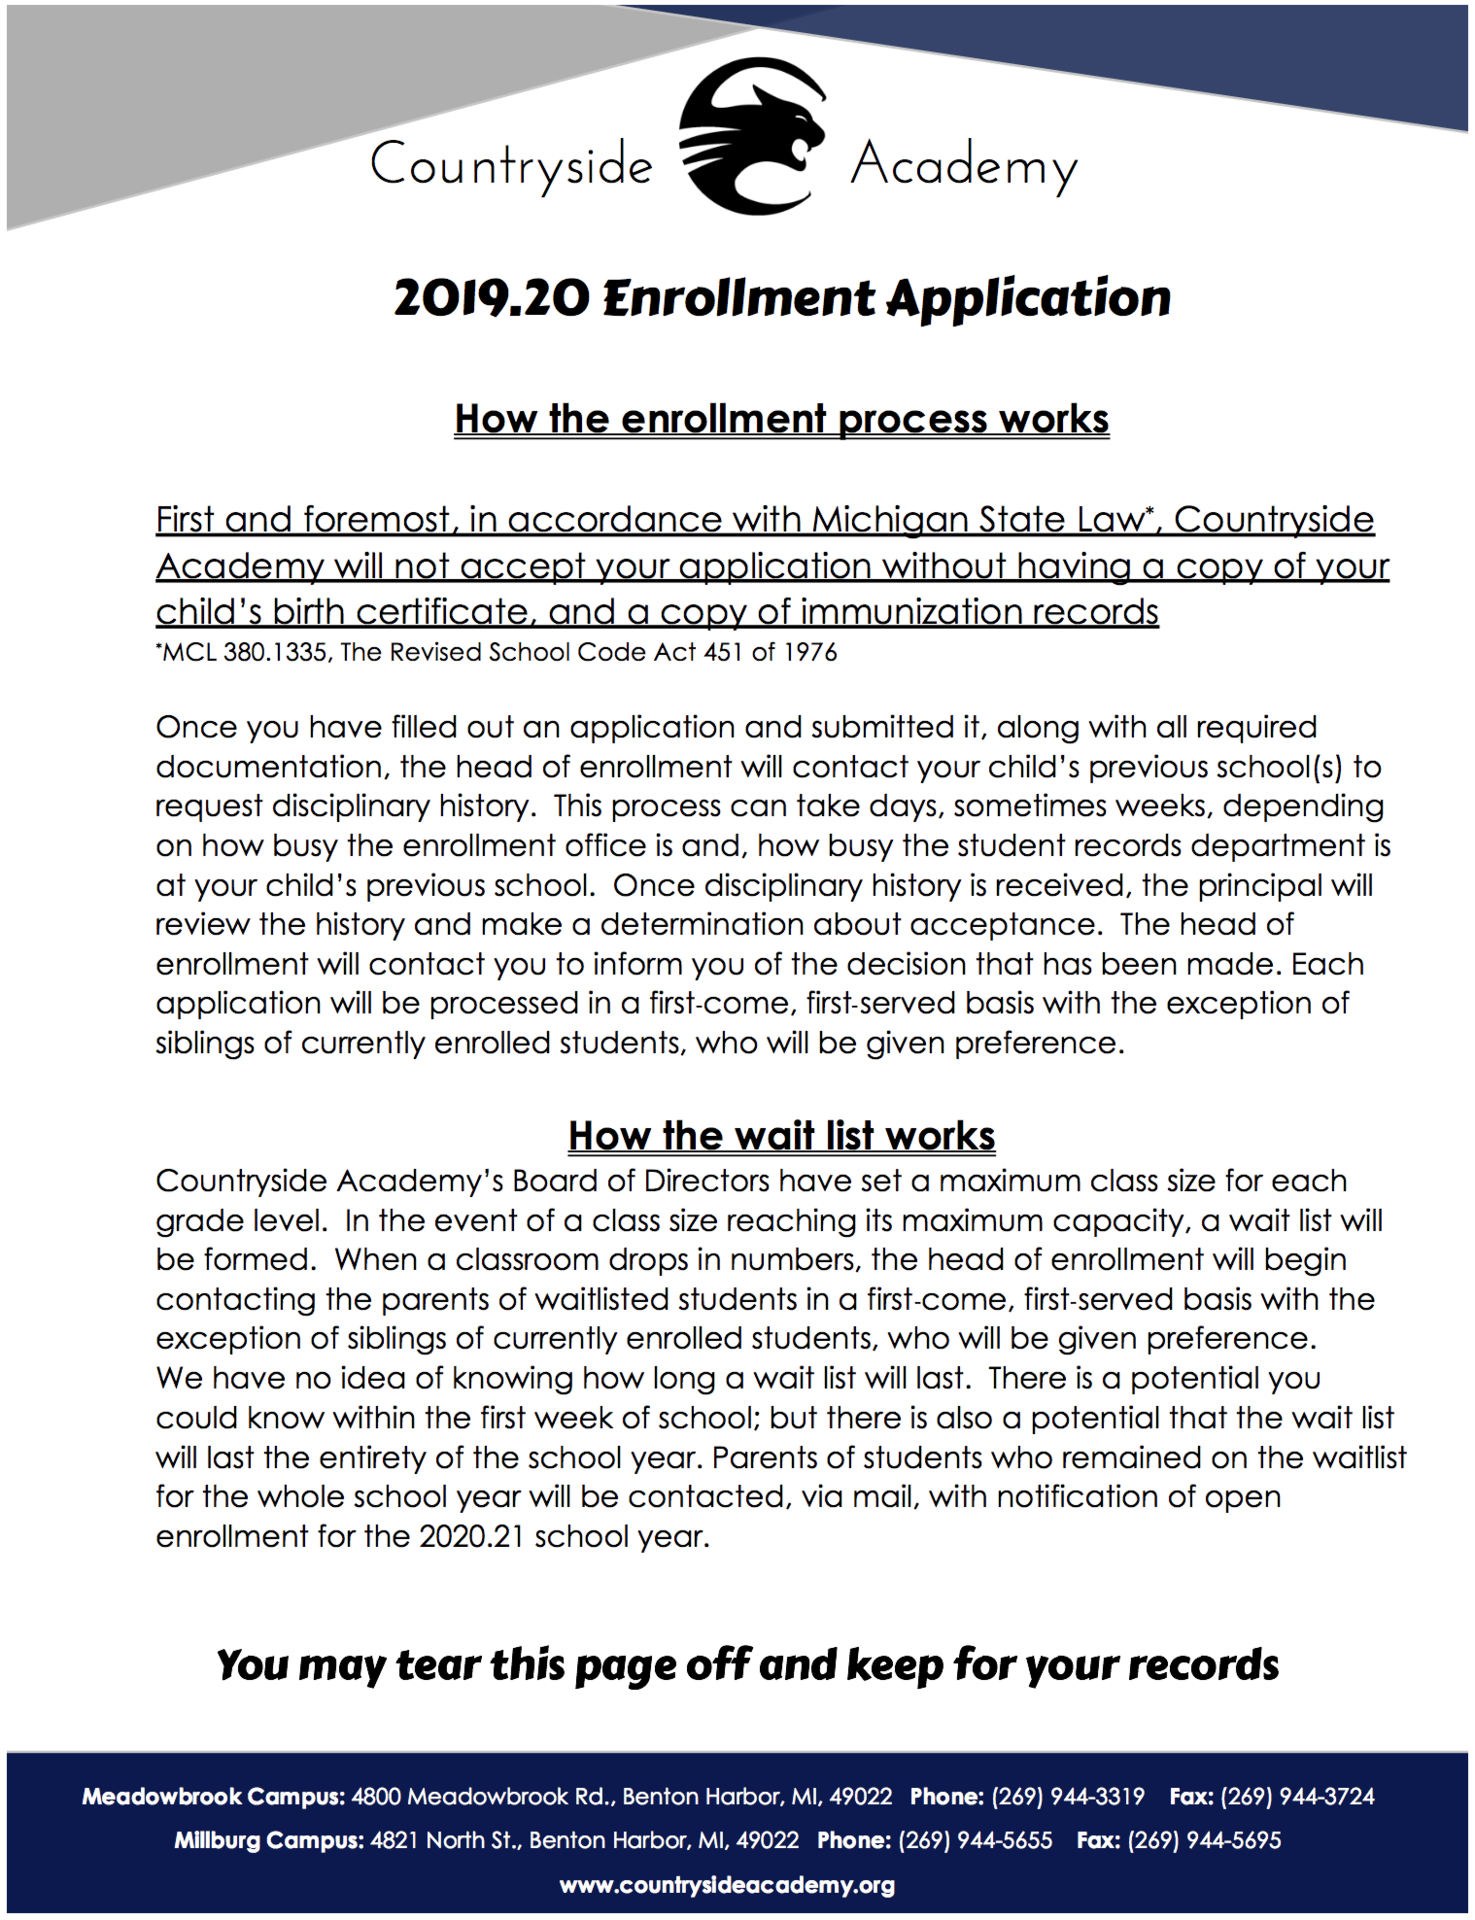 2019-20 Enrollment Application